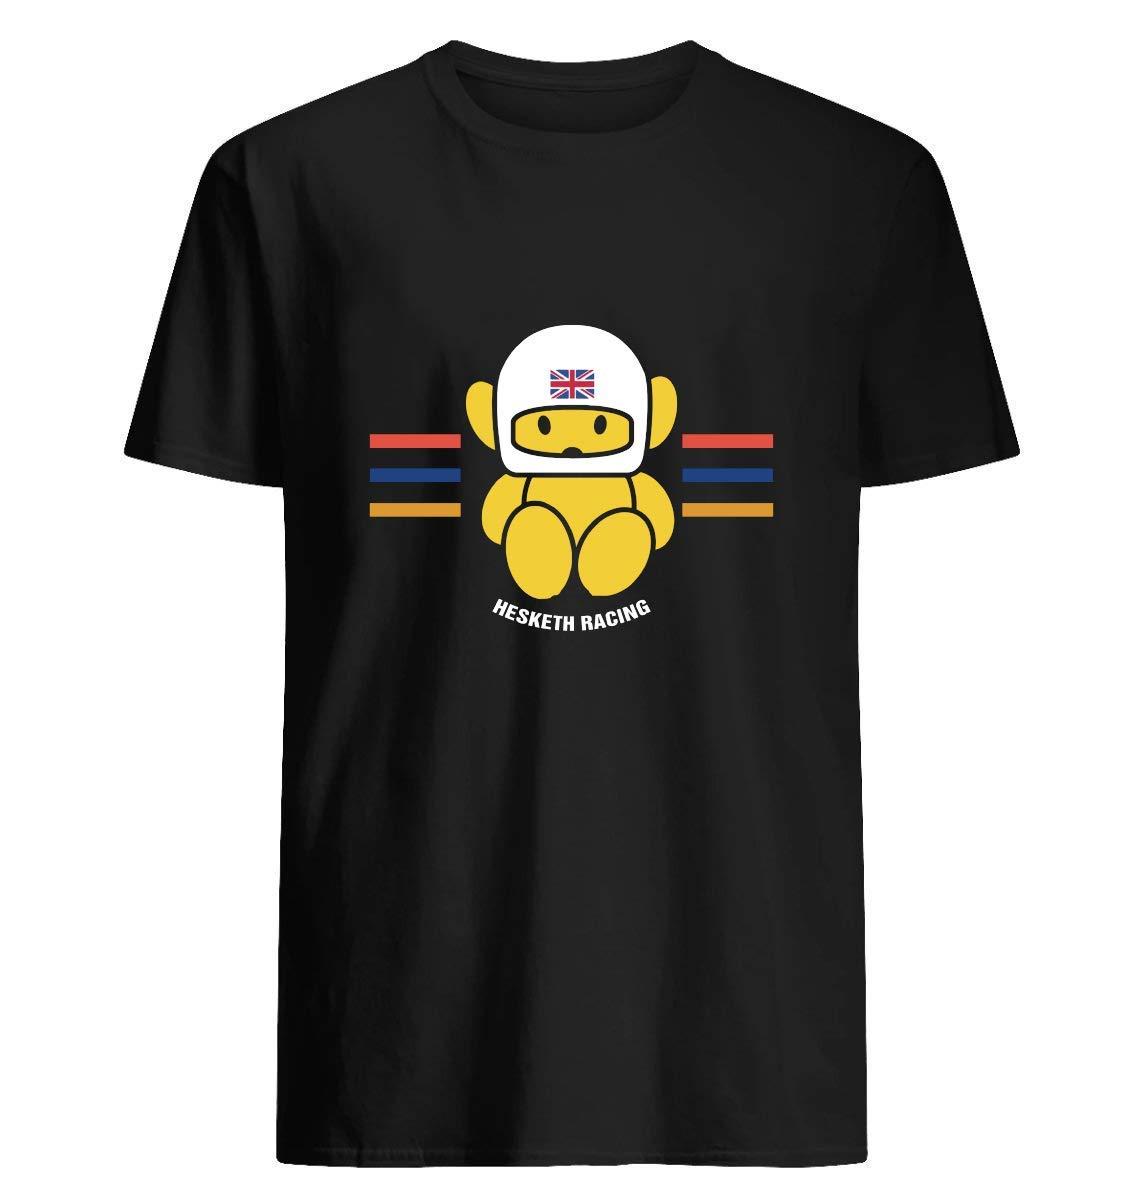 JAMES HUNT F1 TEAM MASCOT 67 T shirt Hoodie for Men Women Unisex